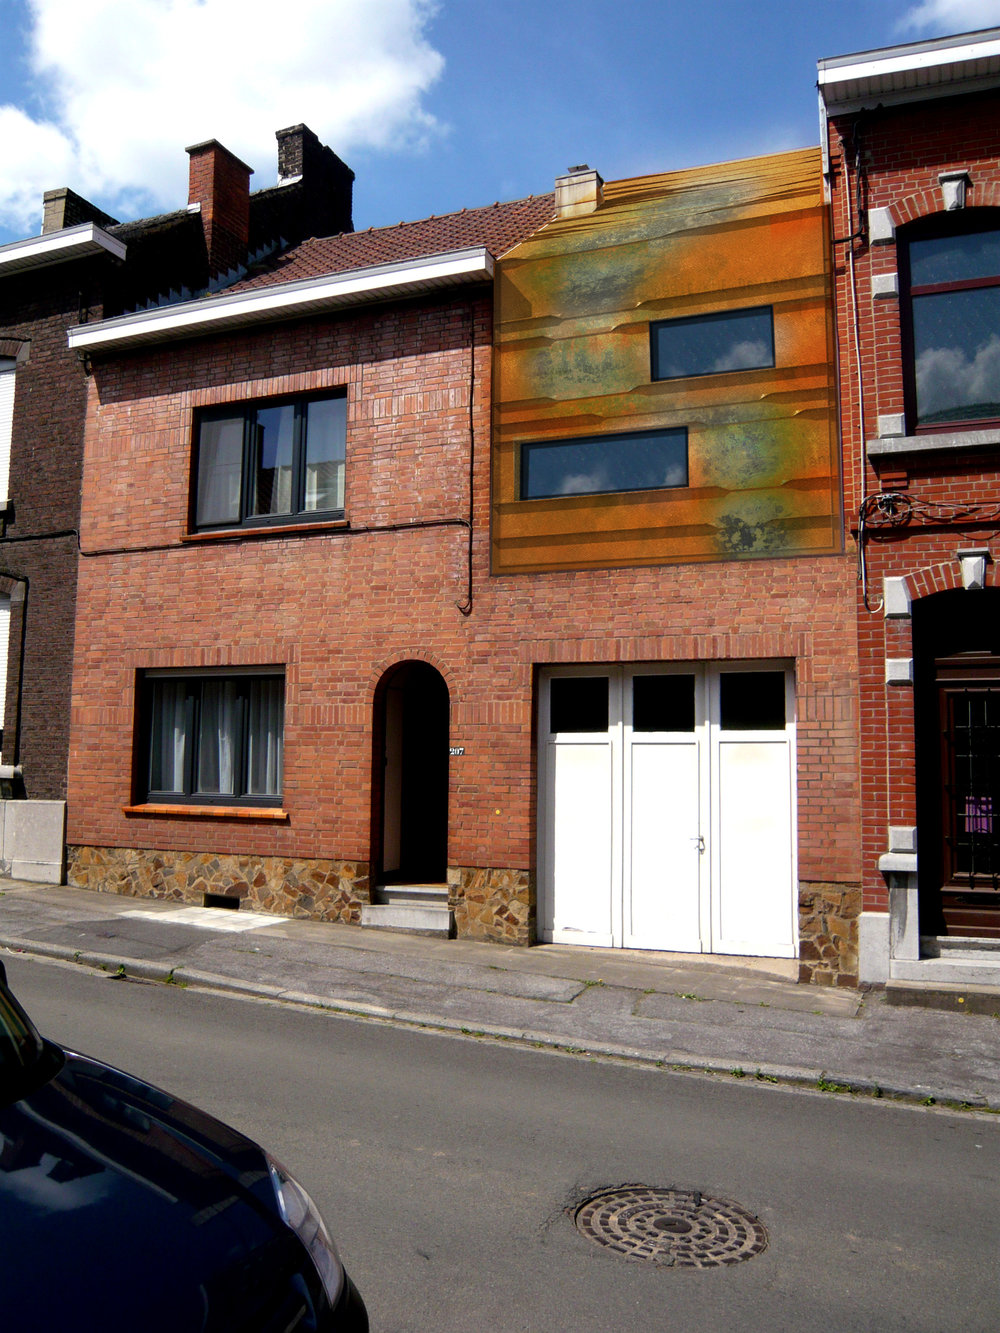 Maison d'Alain Bornain